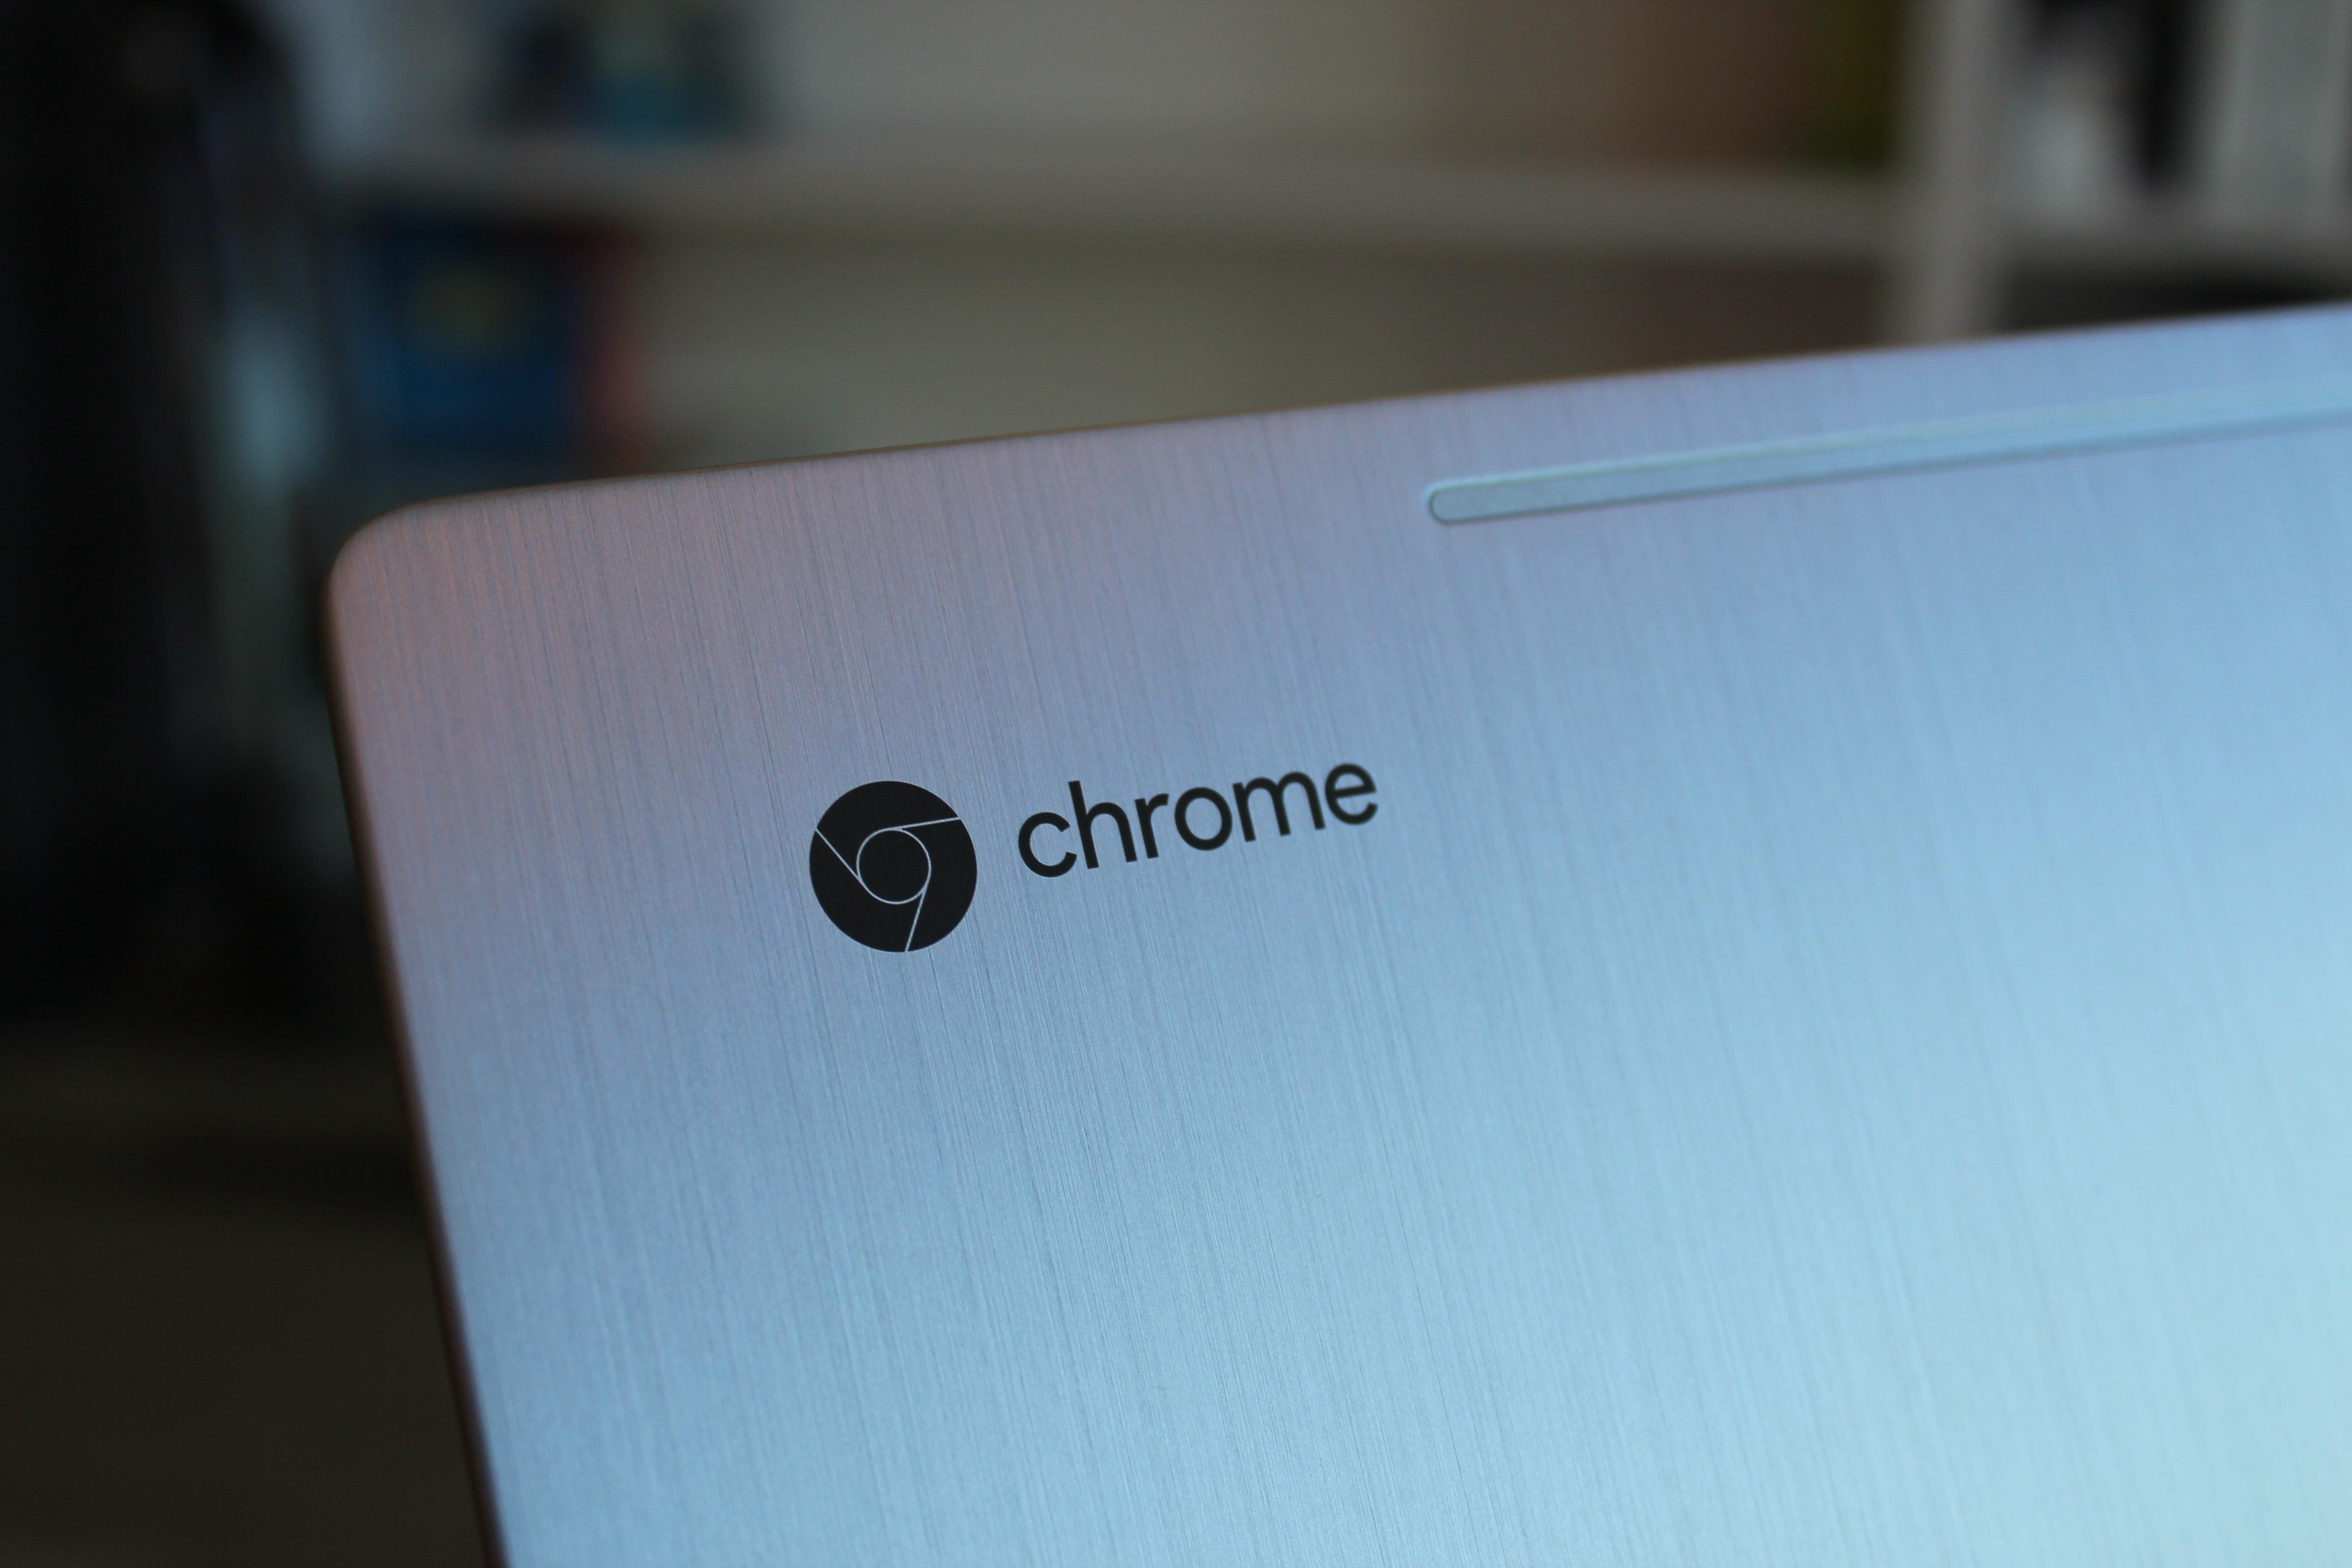 Download Google Chrome for Windows